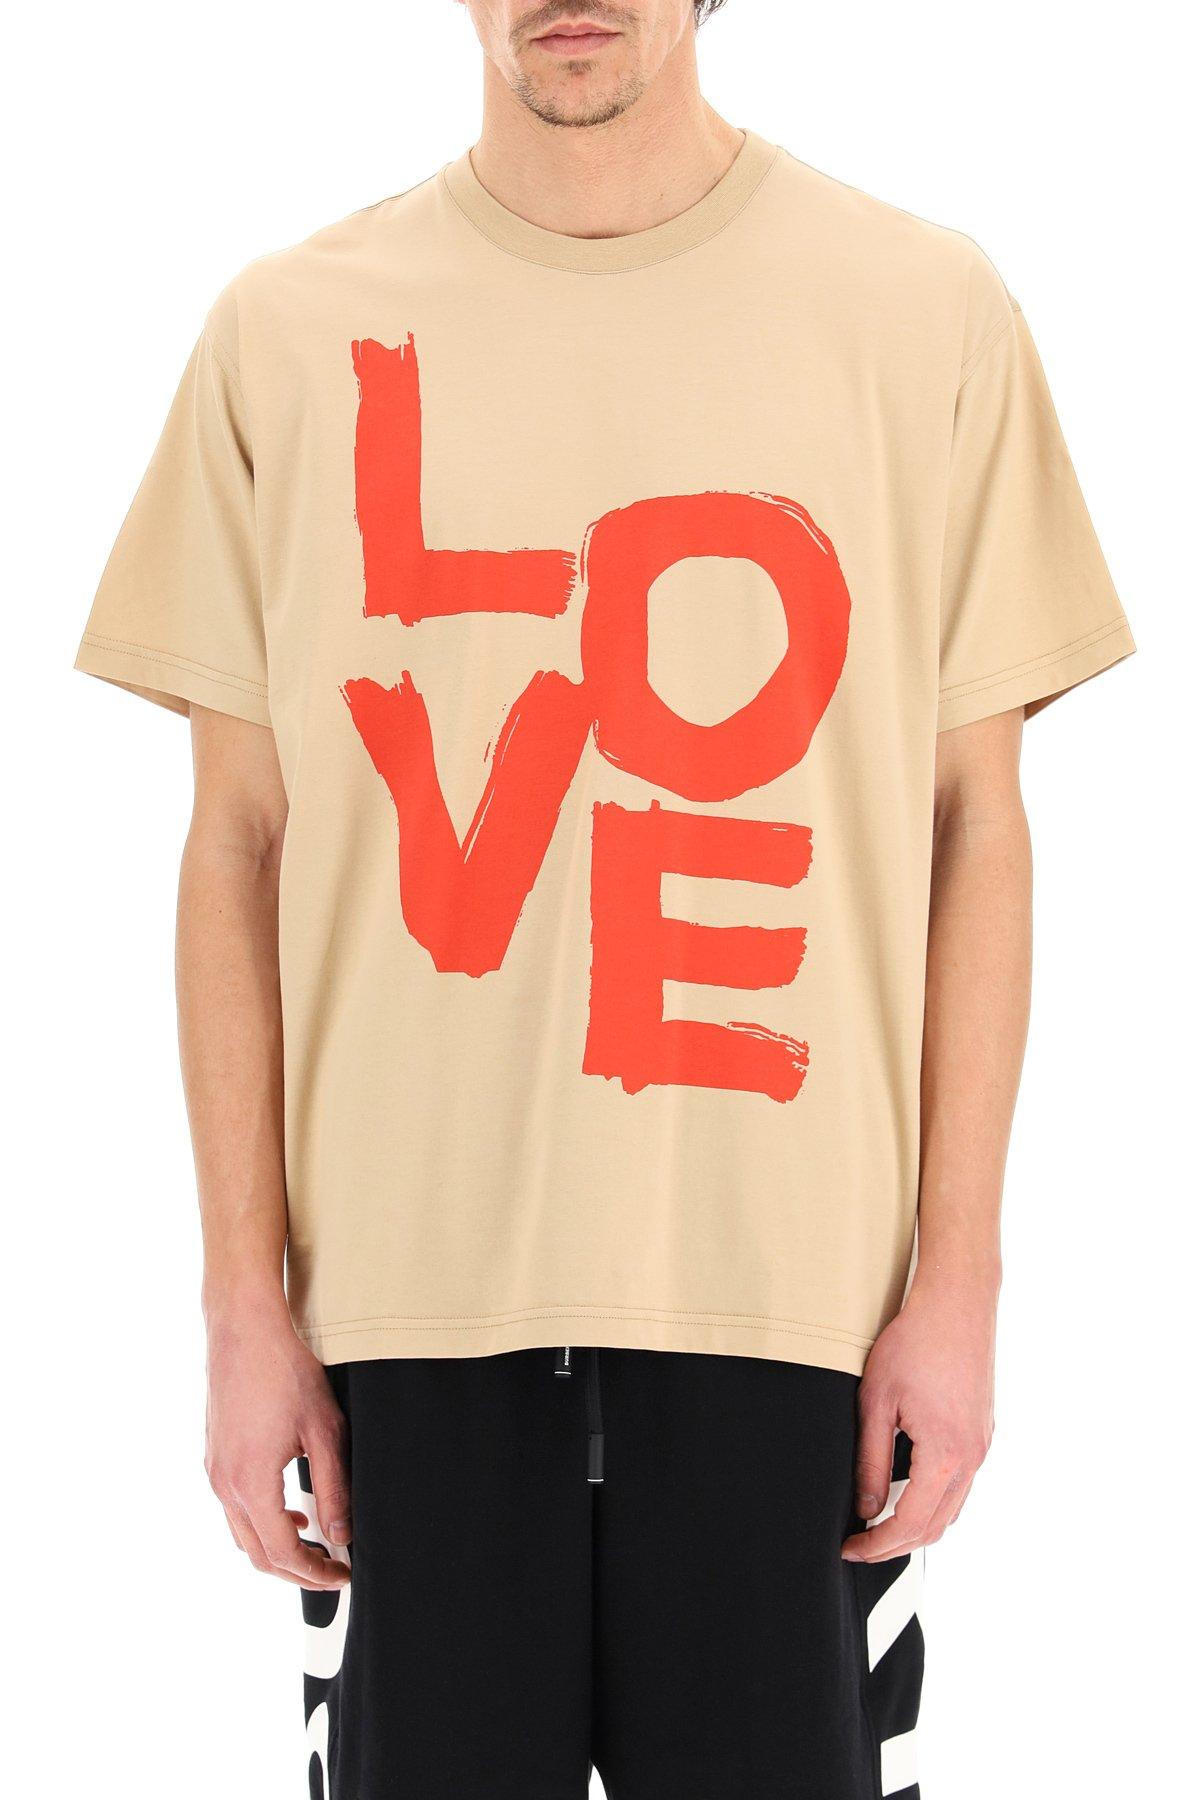 Burberry t-shirt stampa love